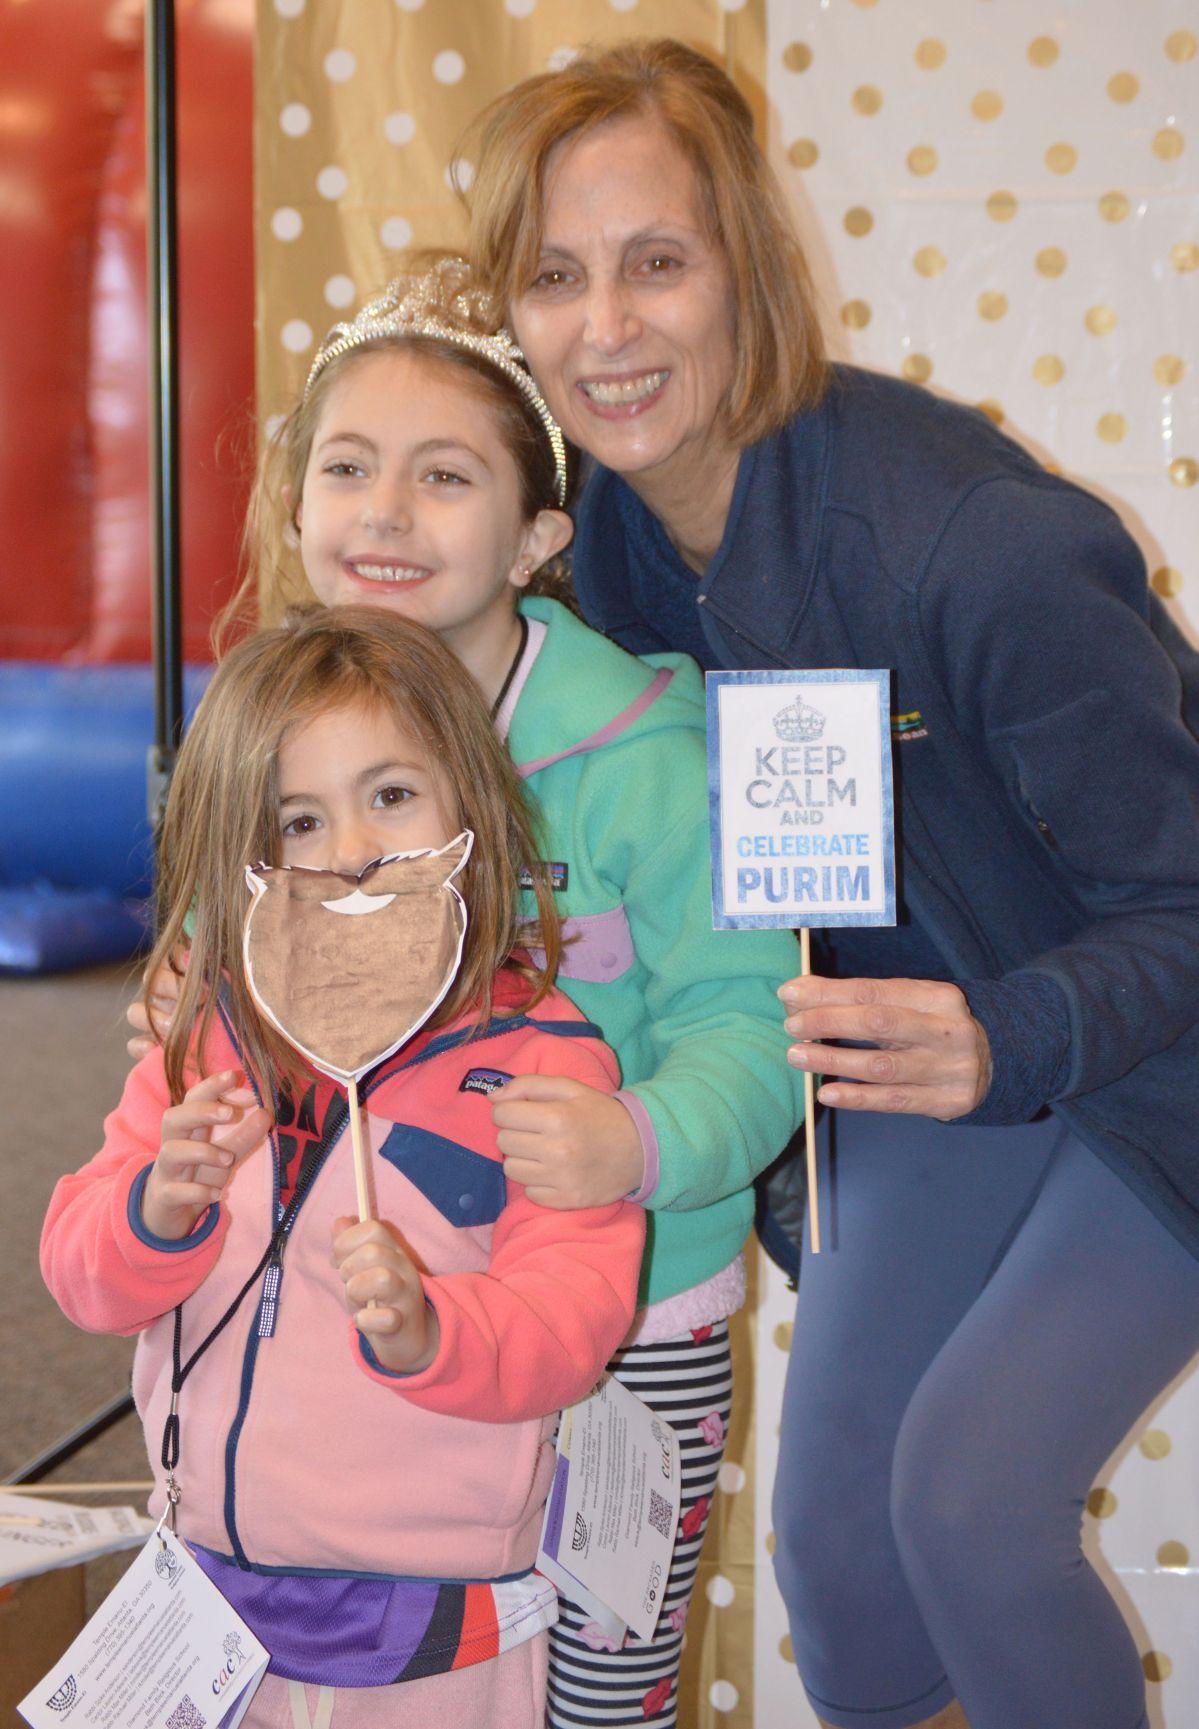 040120_MNS_full_Purim_002 Jennifer Kahnweiler with girls